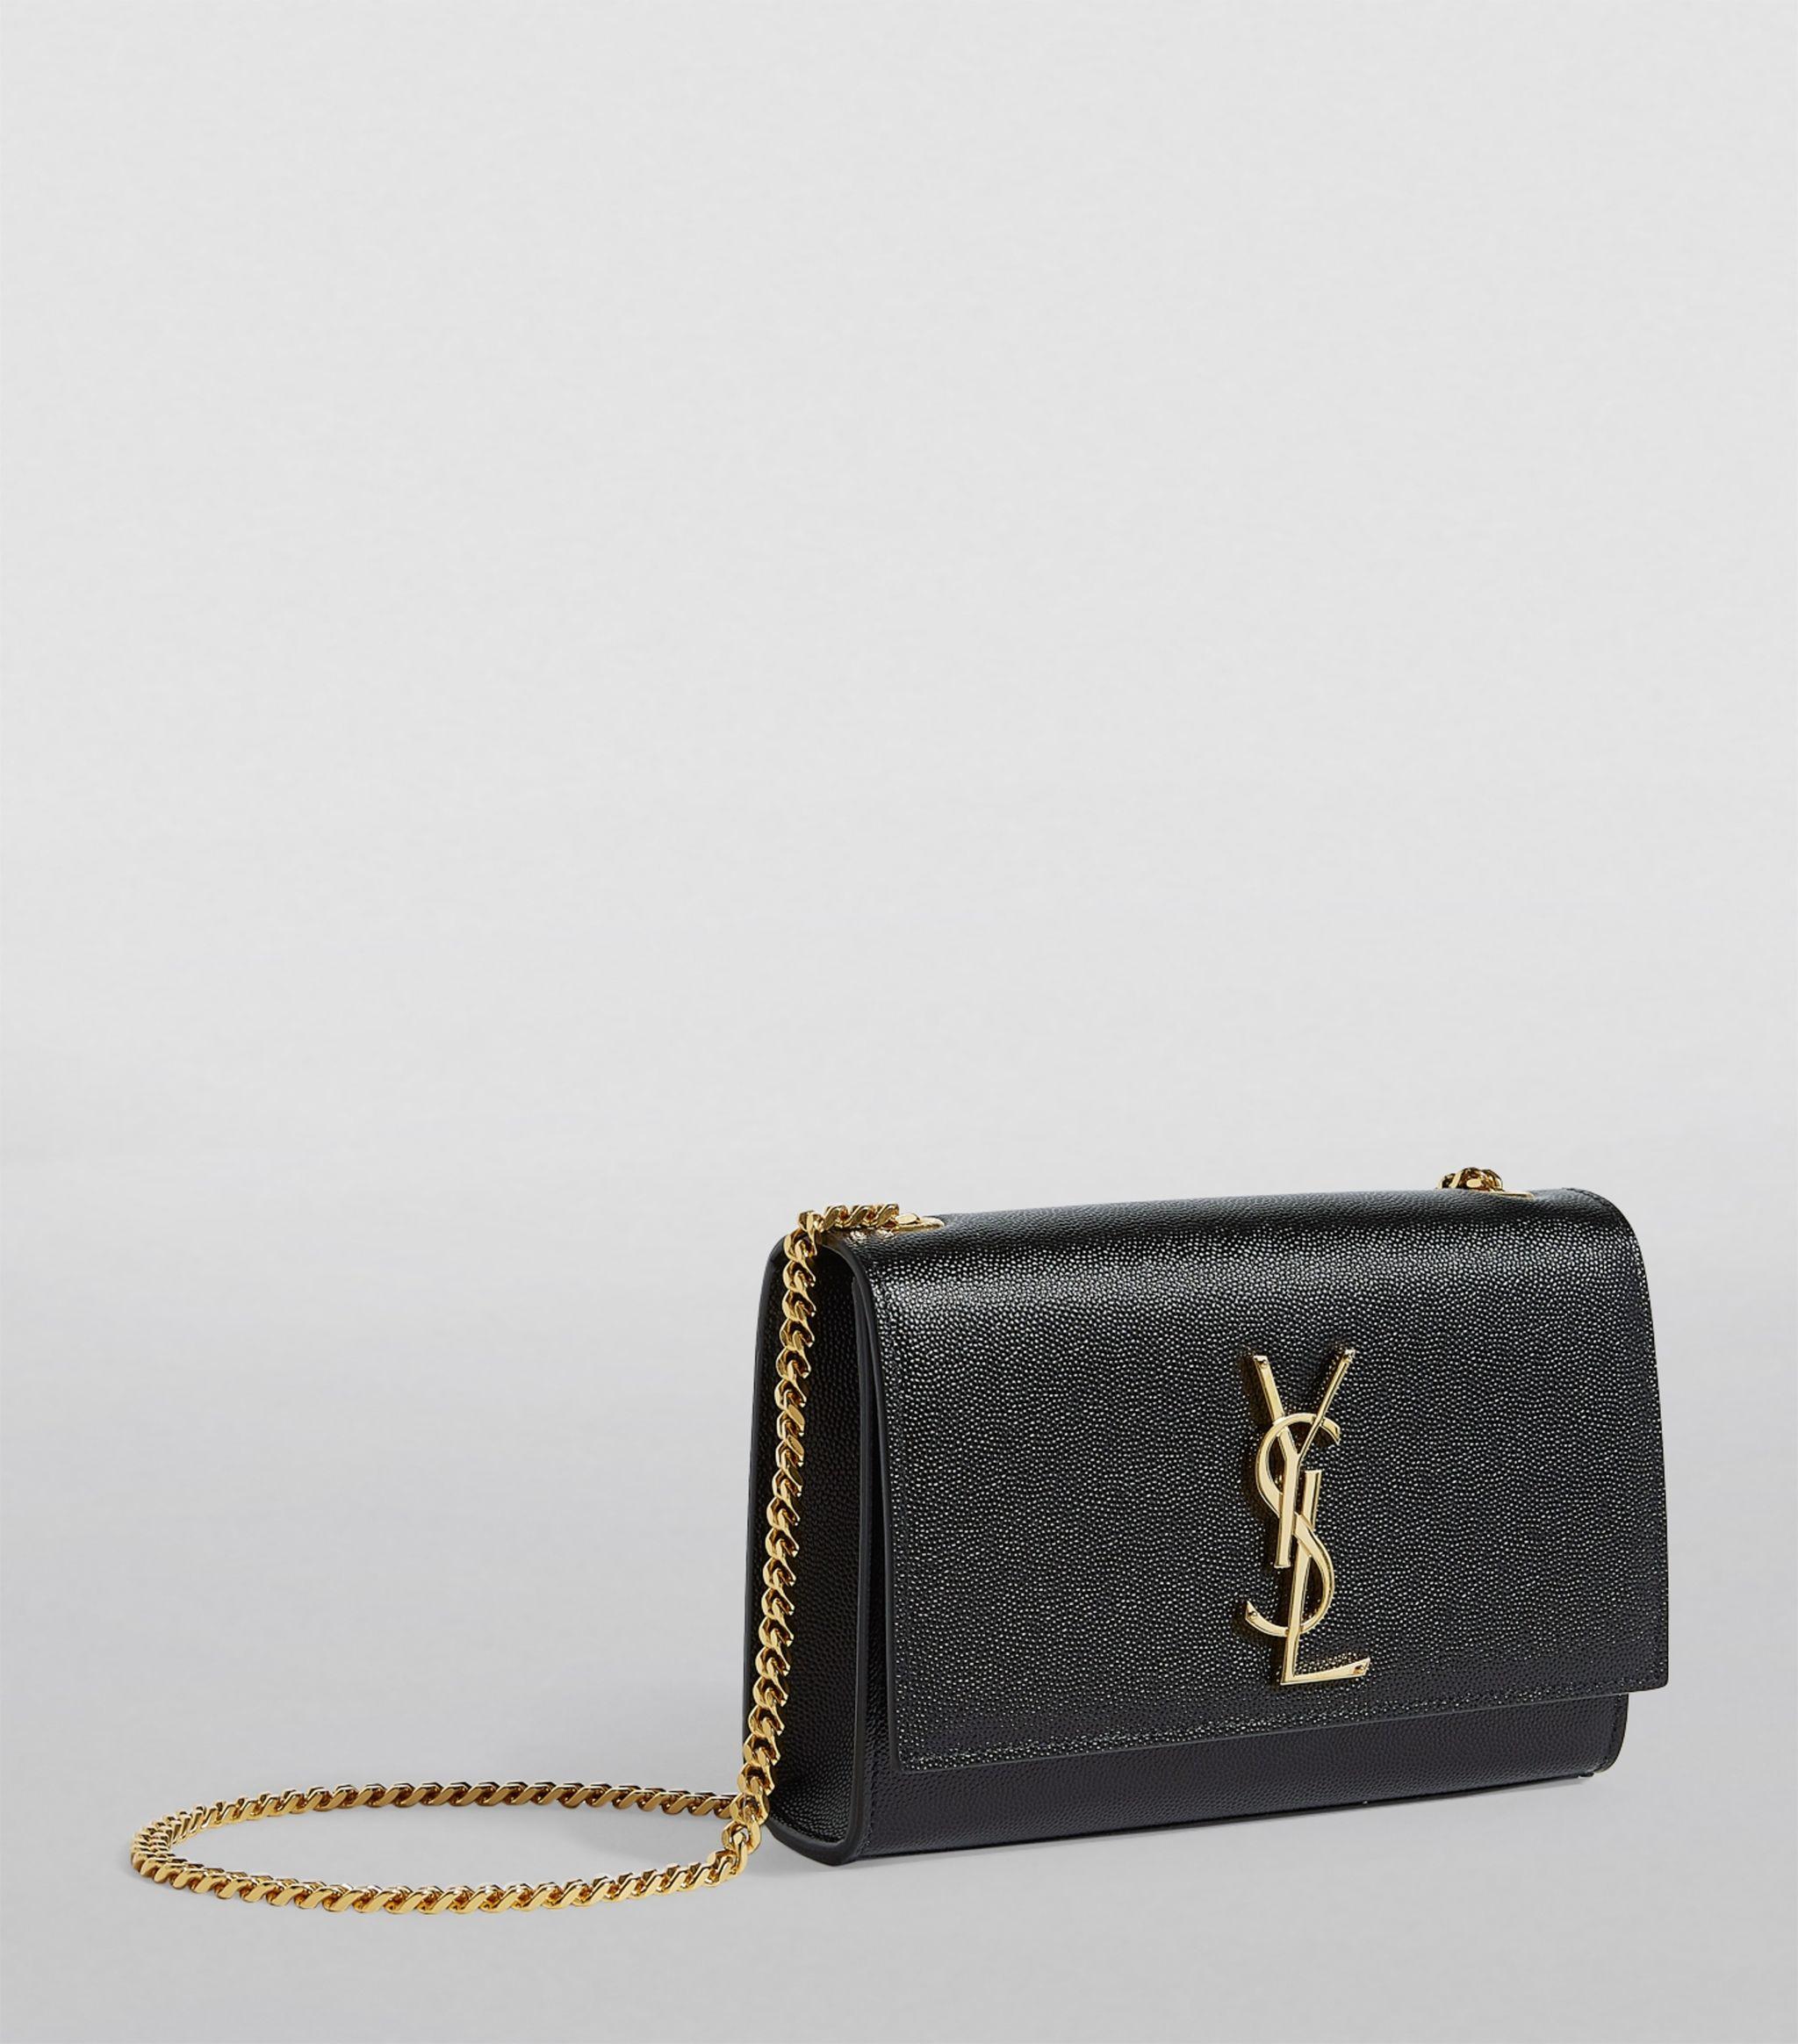 Saint Laurent Bag (YSL(